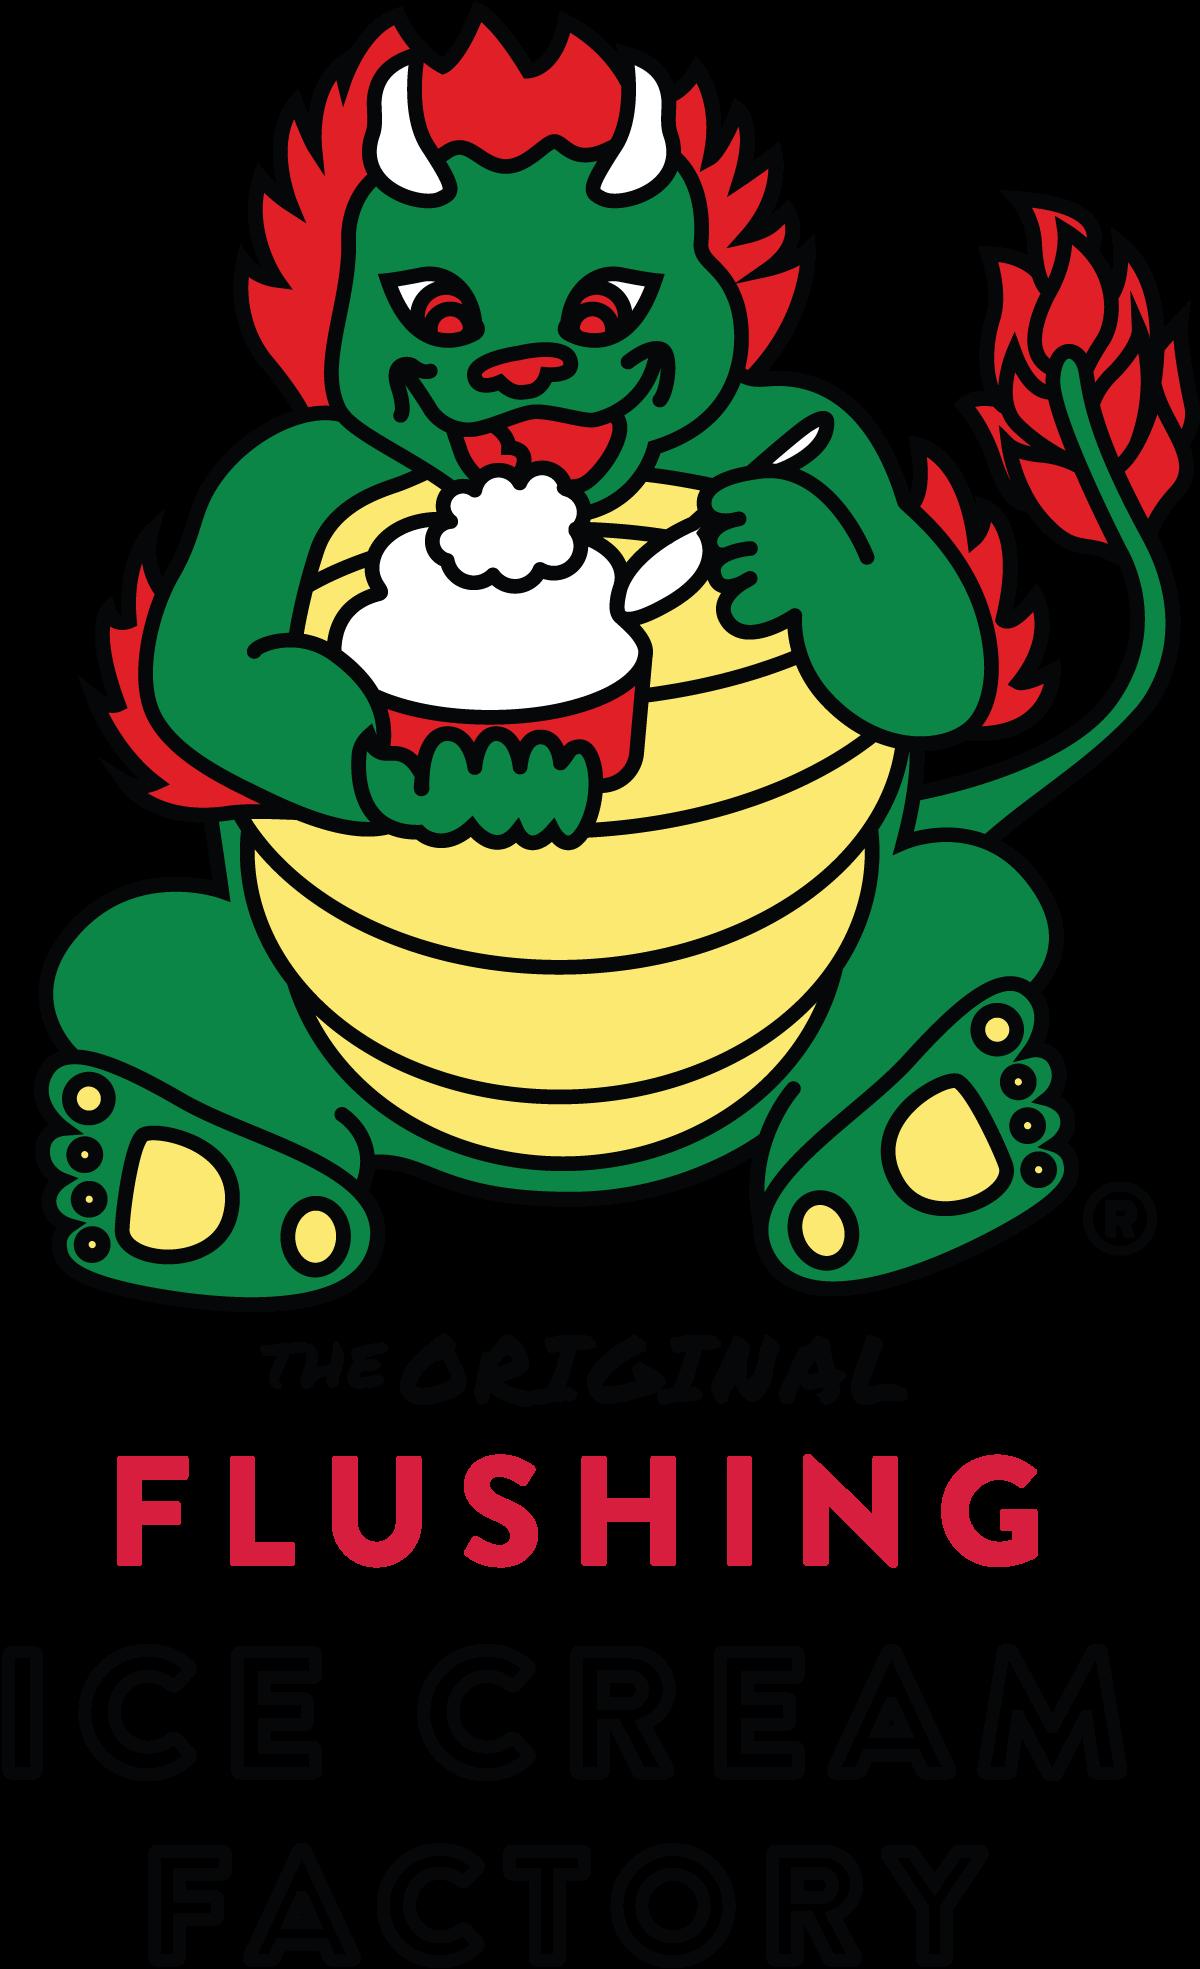 CICF-Flushing-Logo-FullColor.png